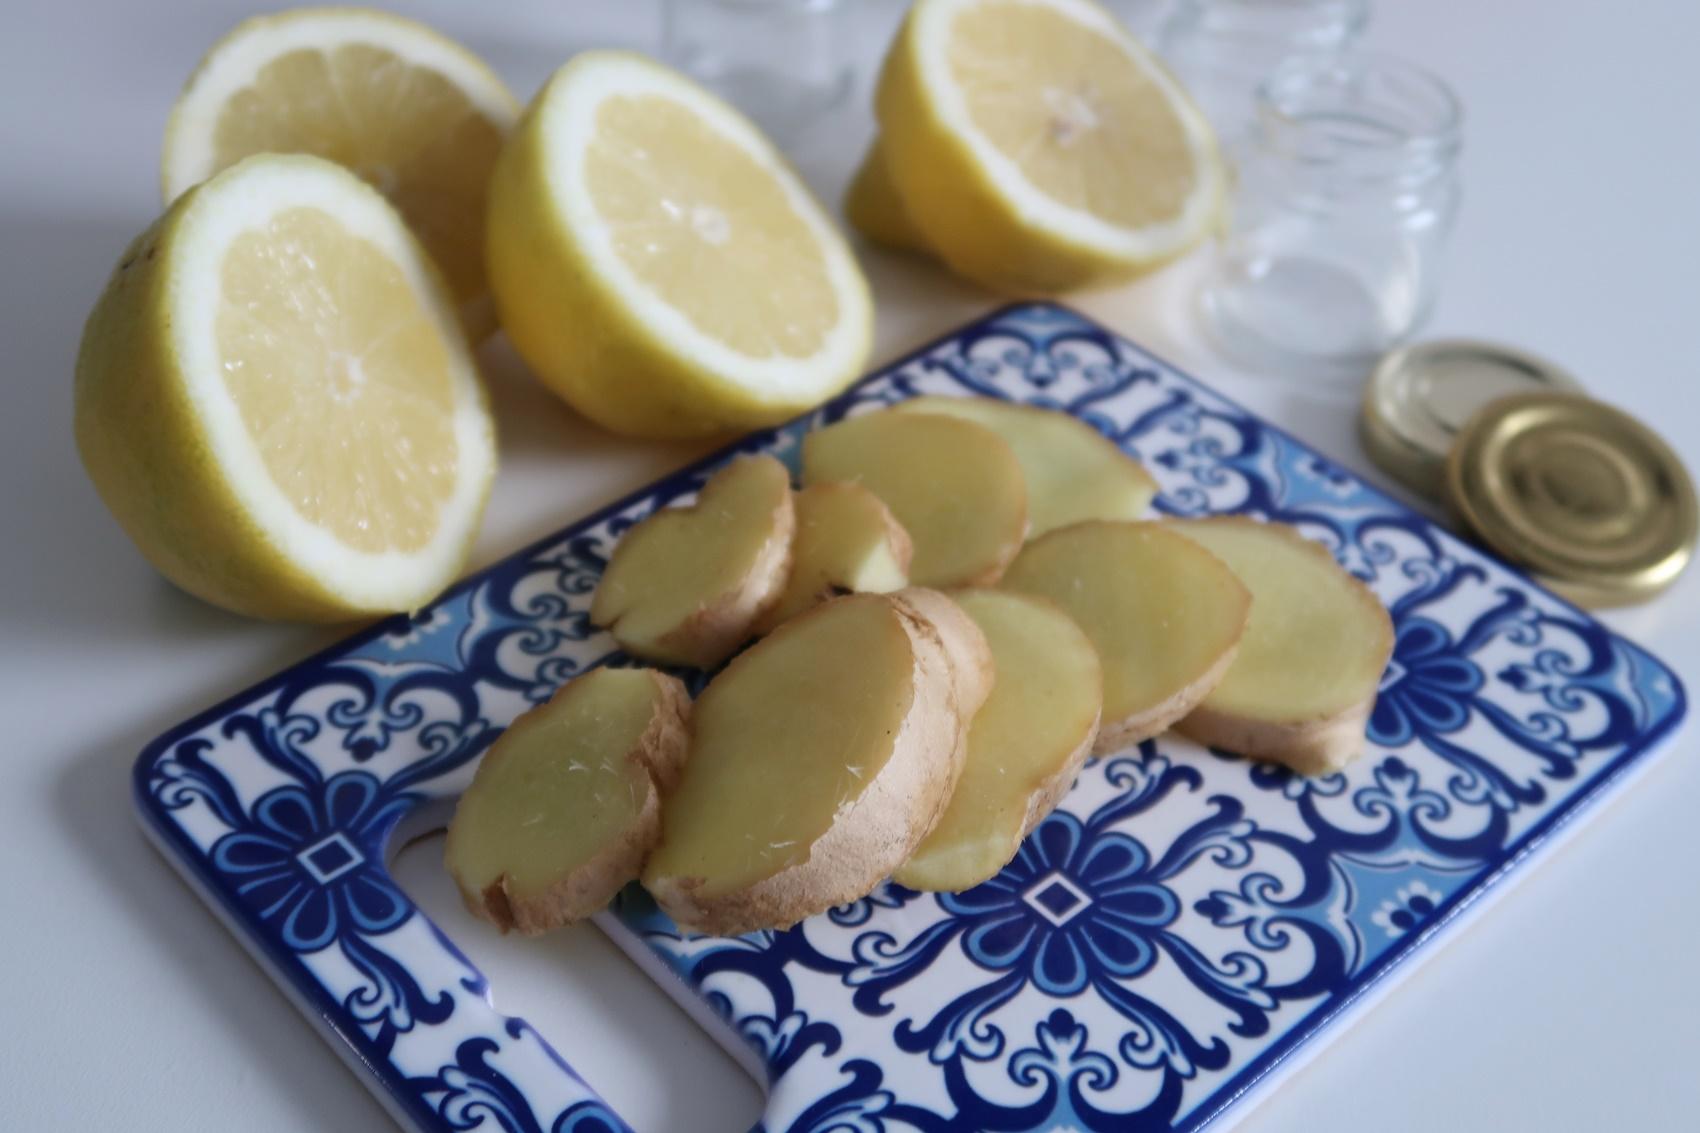 glamupyourlifestyle Ingwer-Shots Ingwer-Shots-Rezept gesunde-rezepte Erkältung Hausmittel